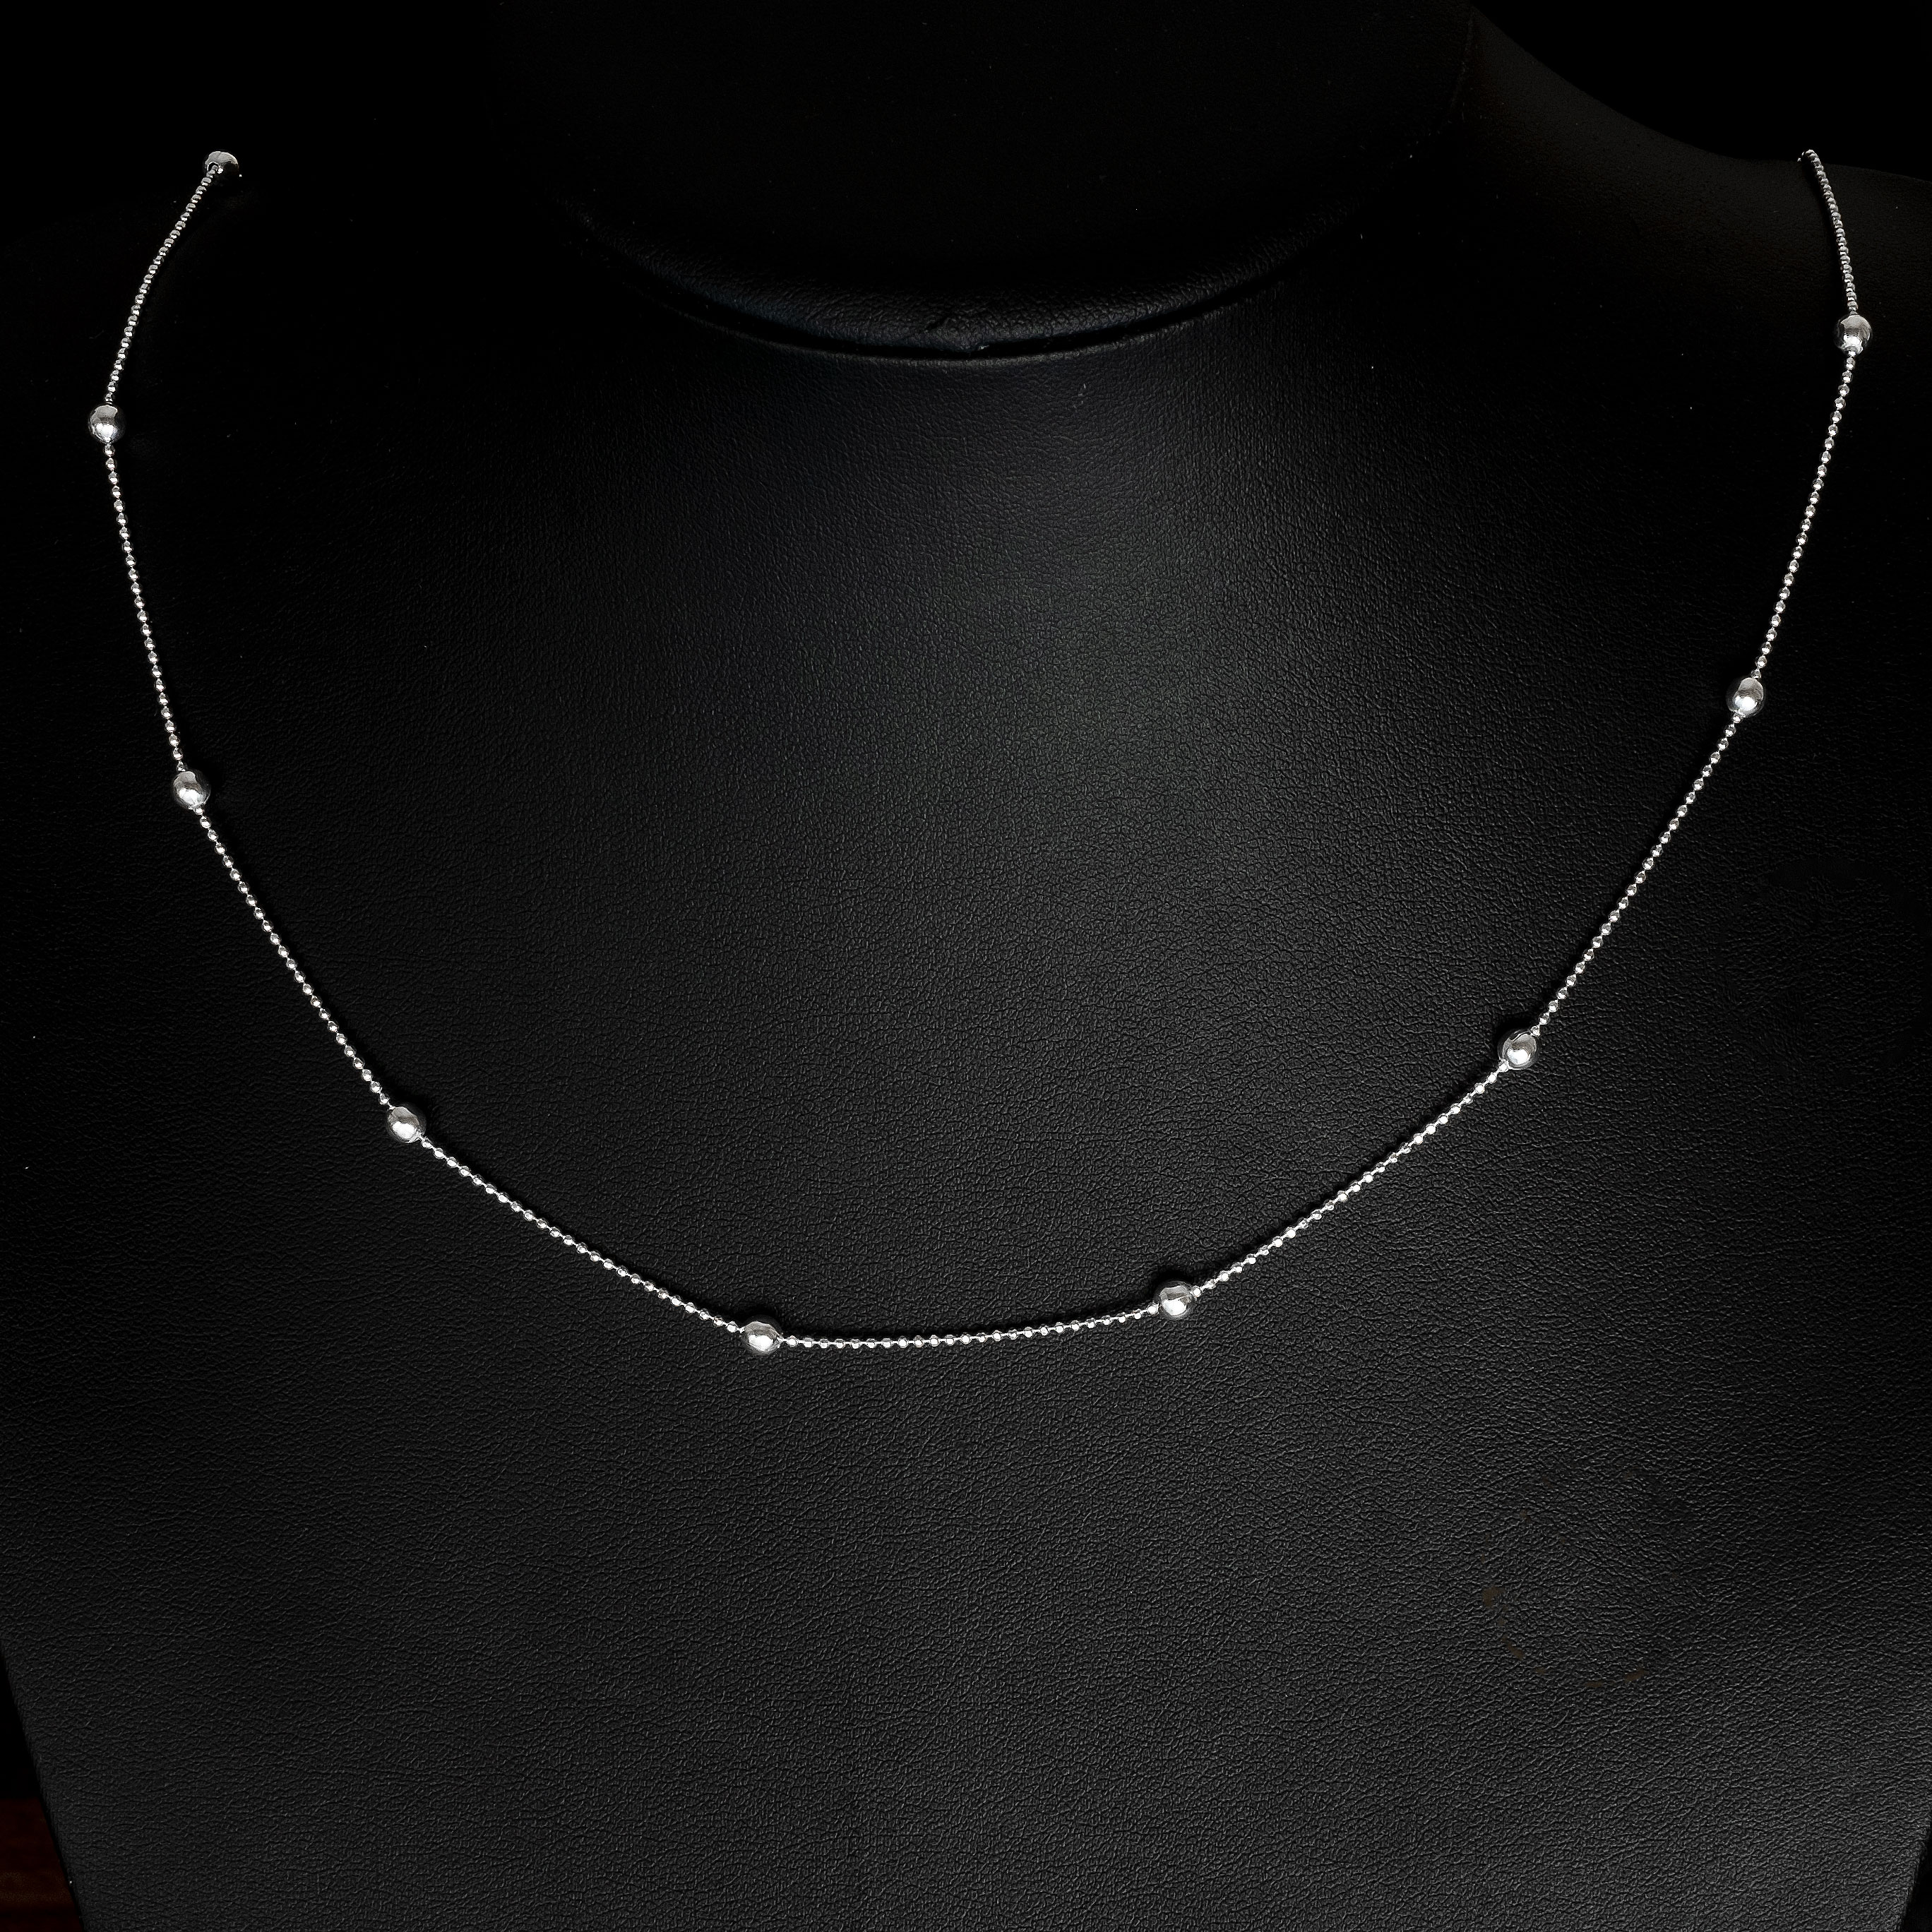 48a3c76ca3e6c Ball Chain 925 Sterling Silver Silver Ball - Jewelry Necklace 45-80cm New-  Model